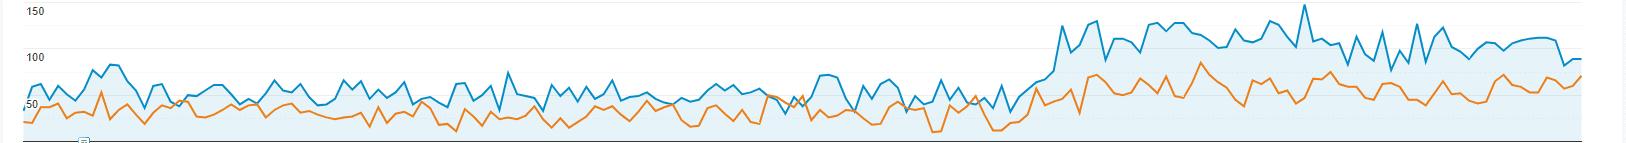 Google Analytics graph for Lead Generation SEO case study